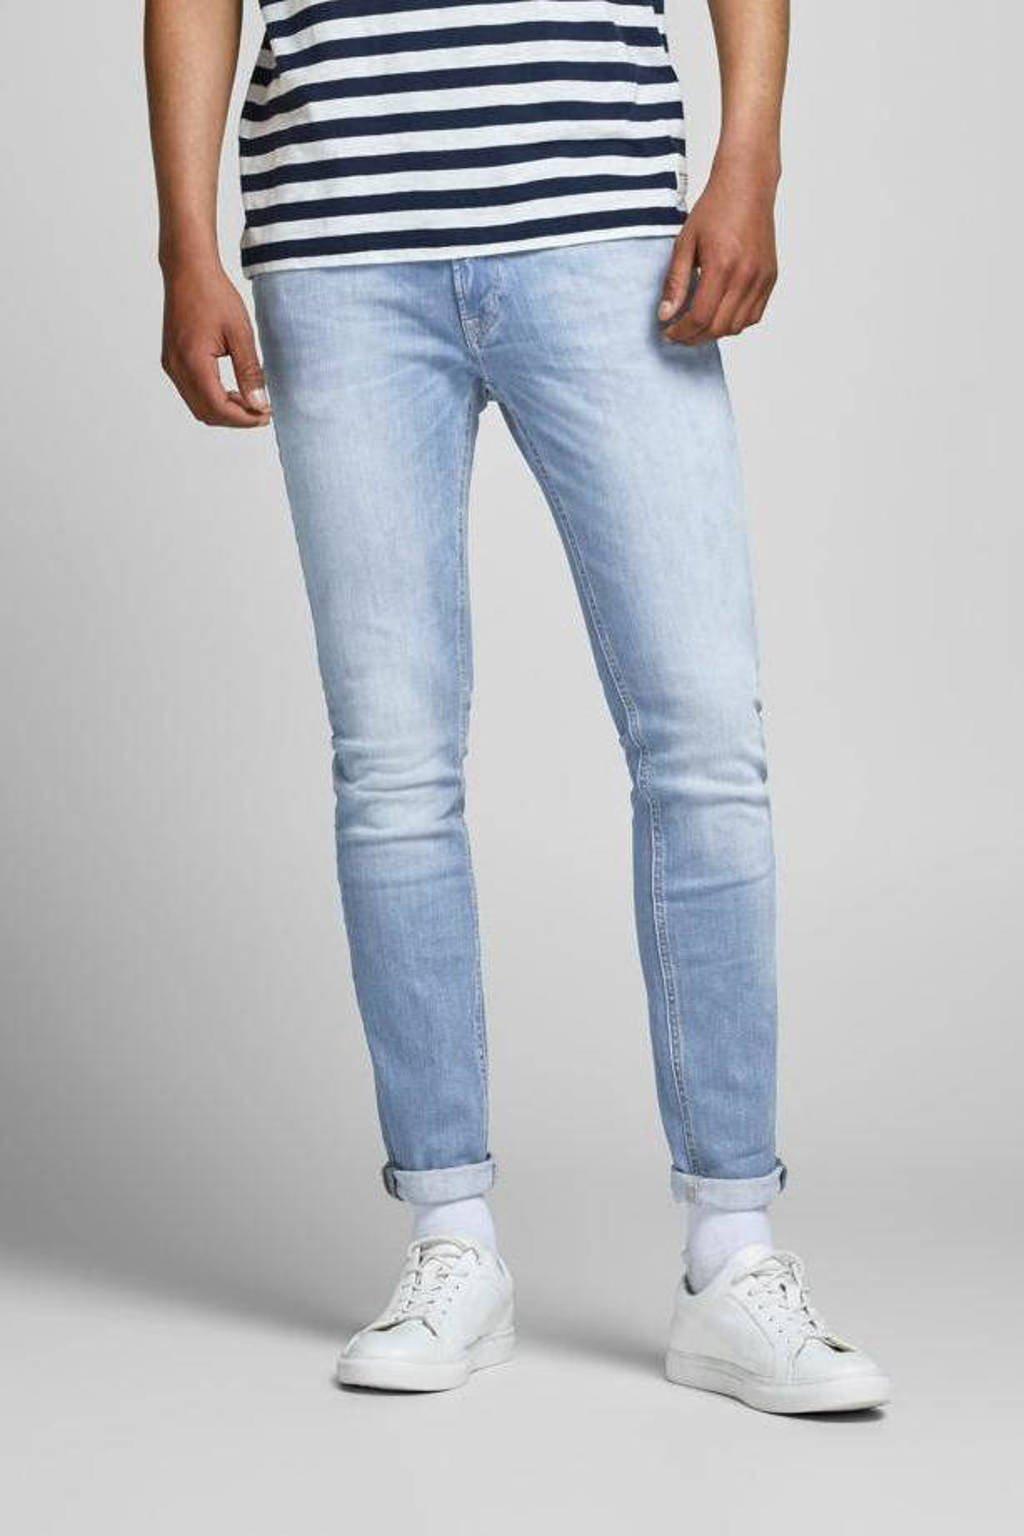 JACK & JONES JEANS INTELLIGENCE skinny jeans JJILIAM JJORIGINAL light denim, Light denim